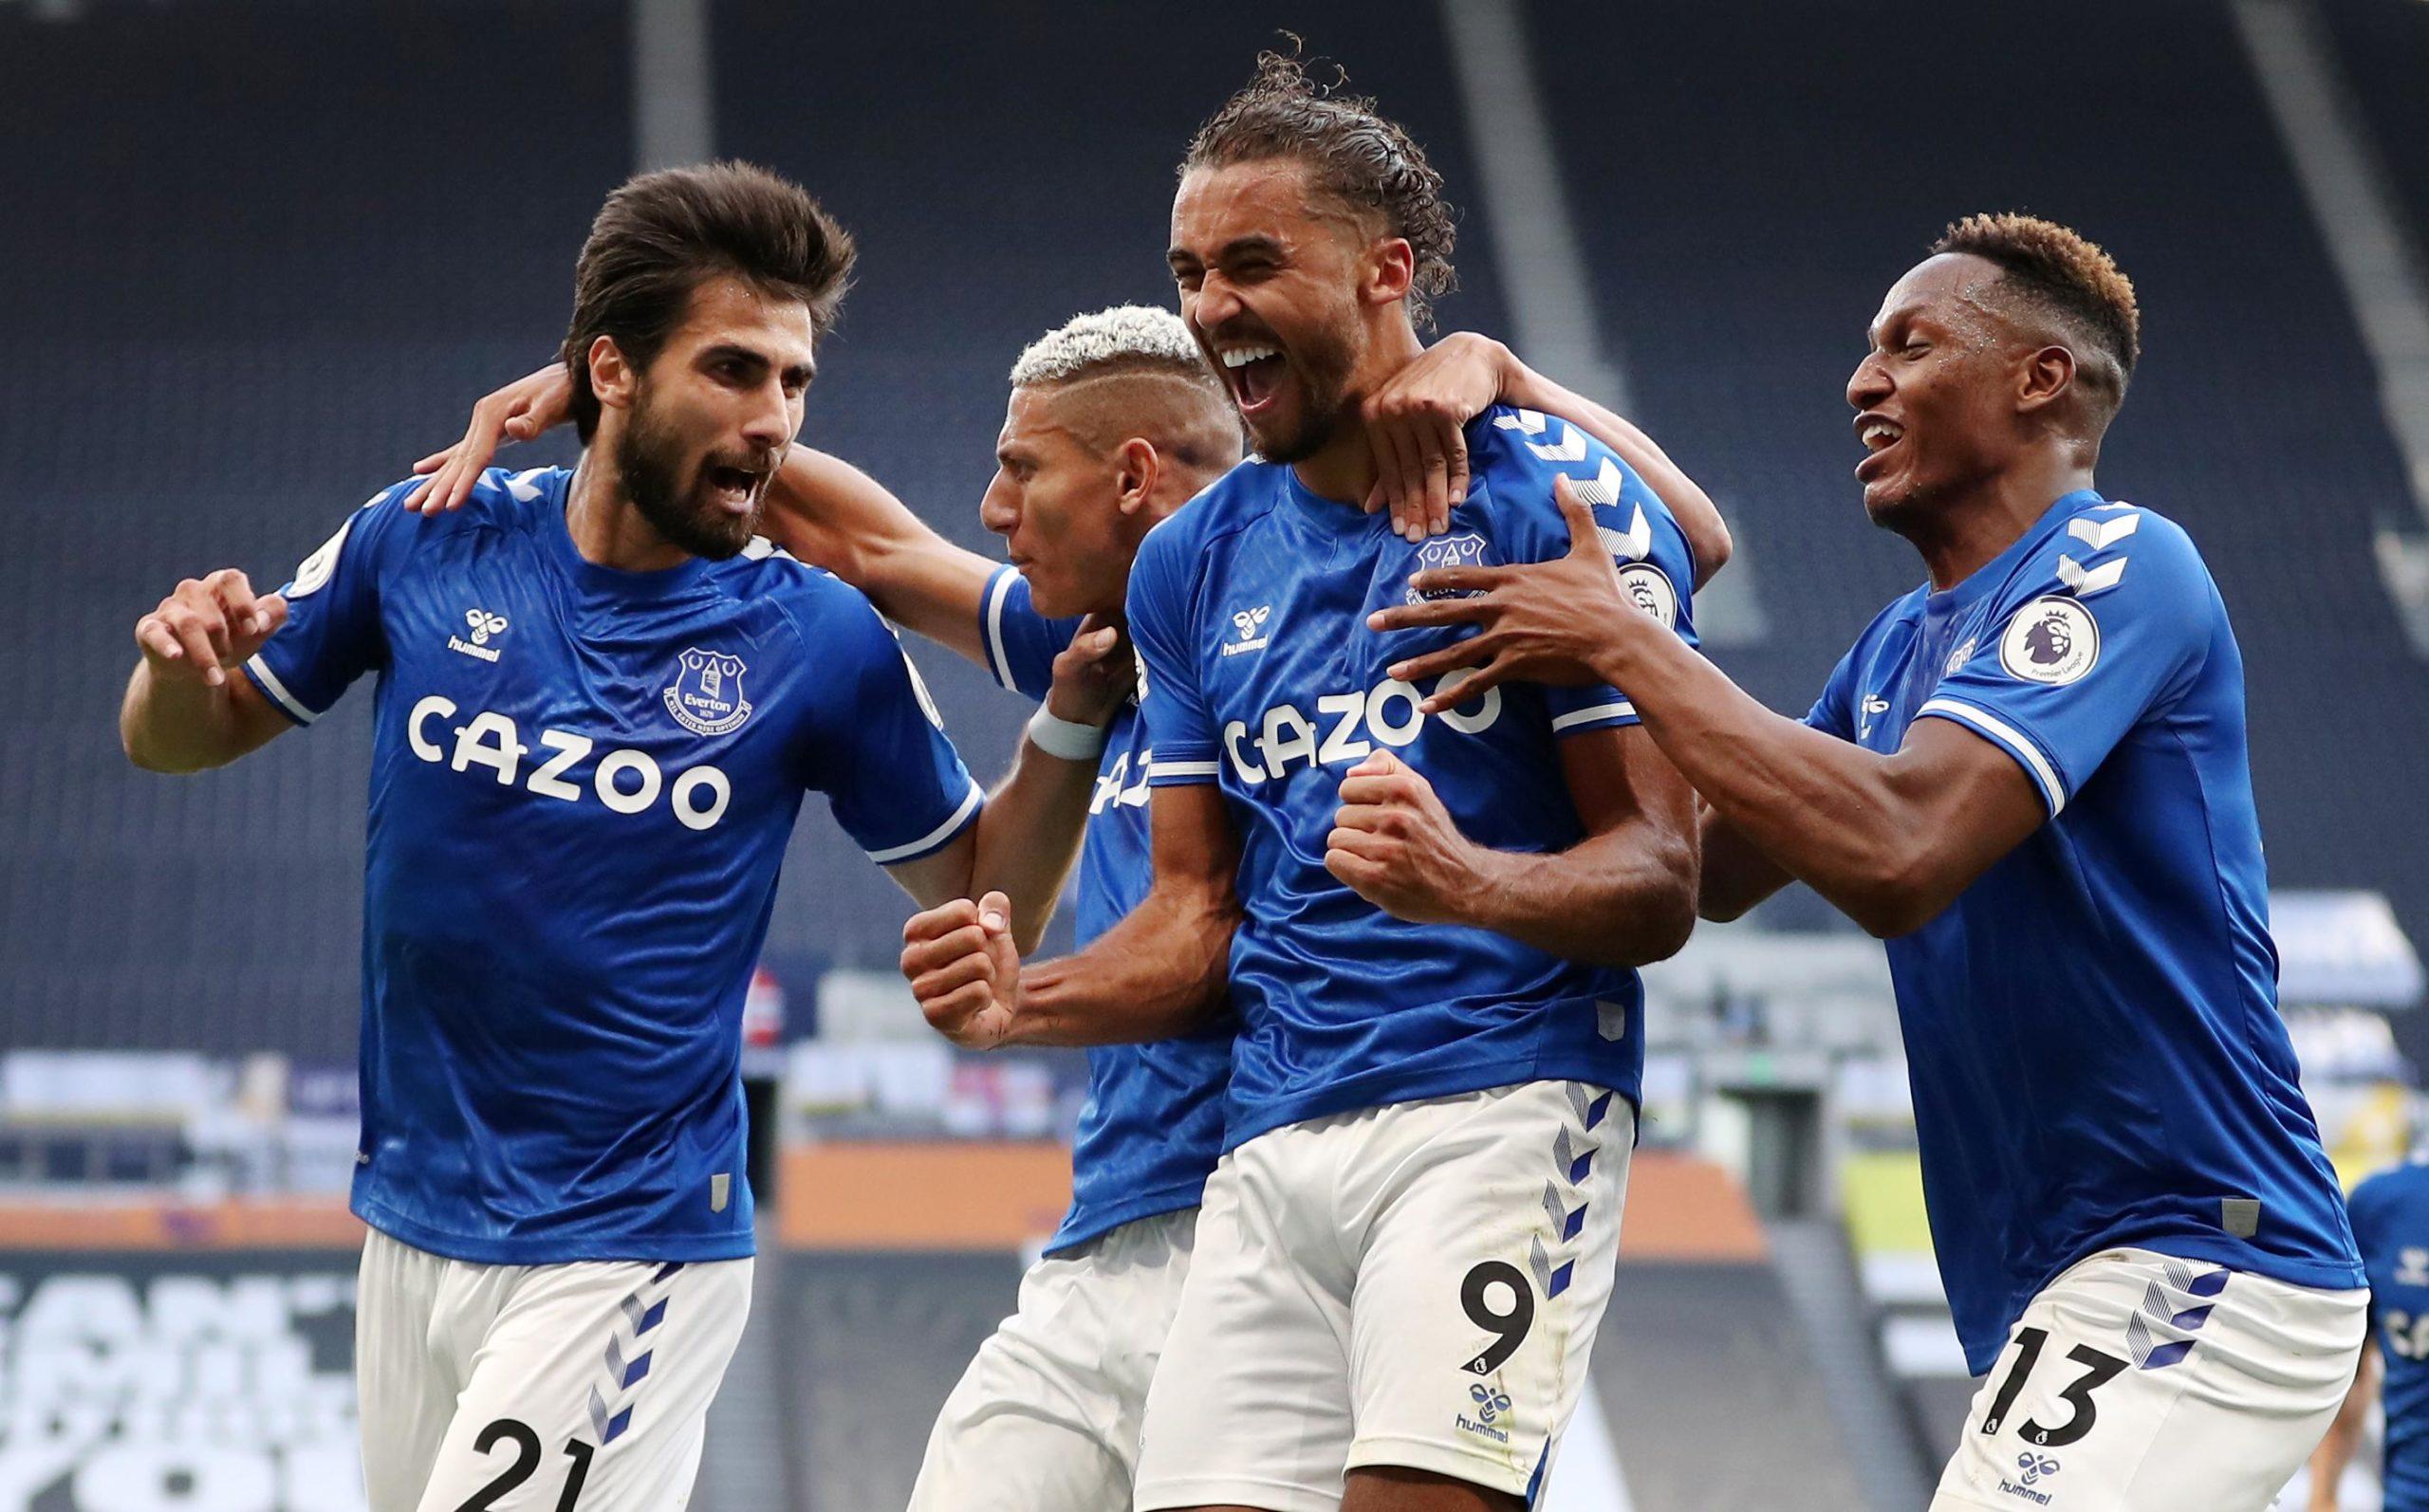 Premier League Roundup 2020/21: Gameweek 1